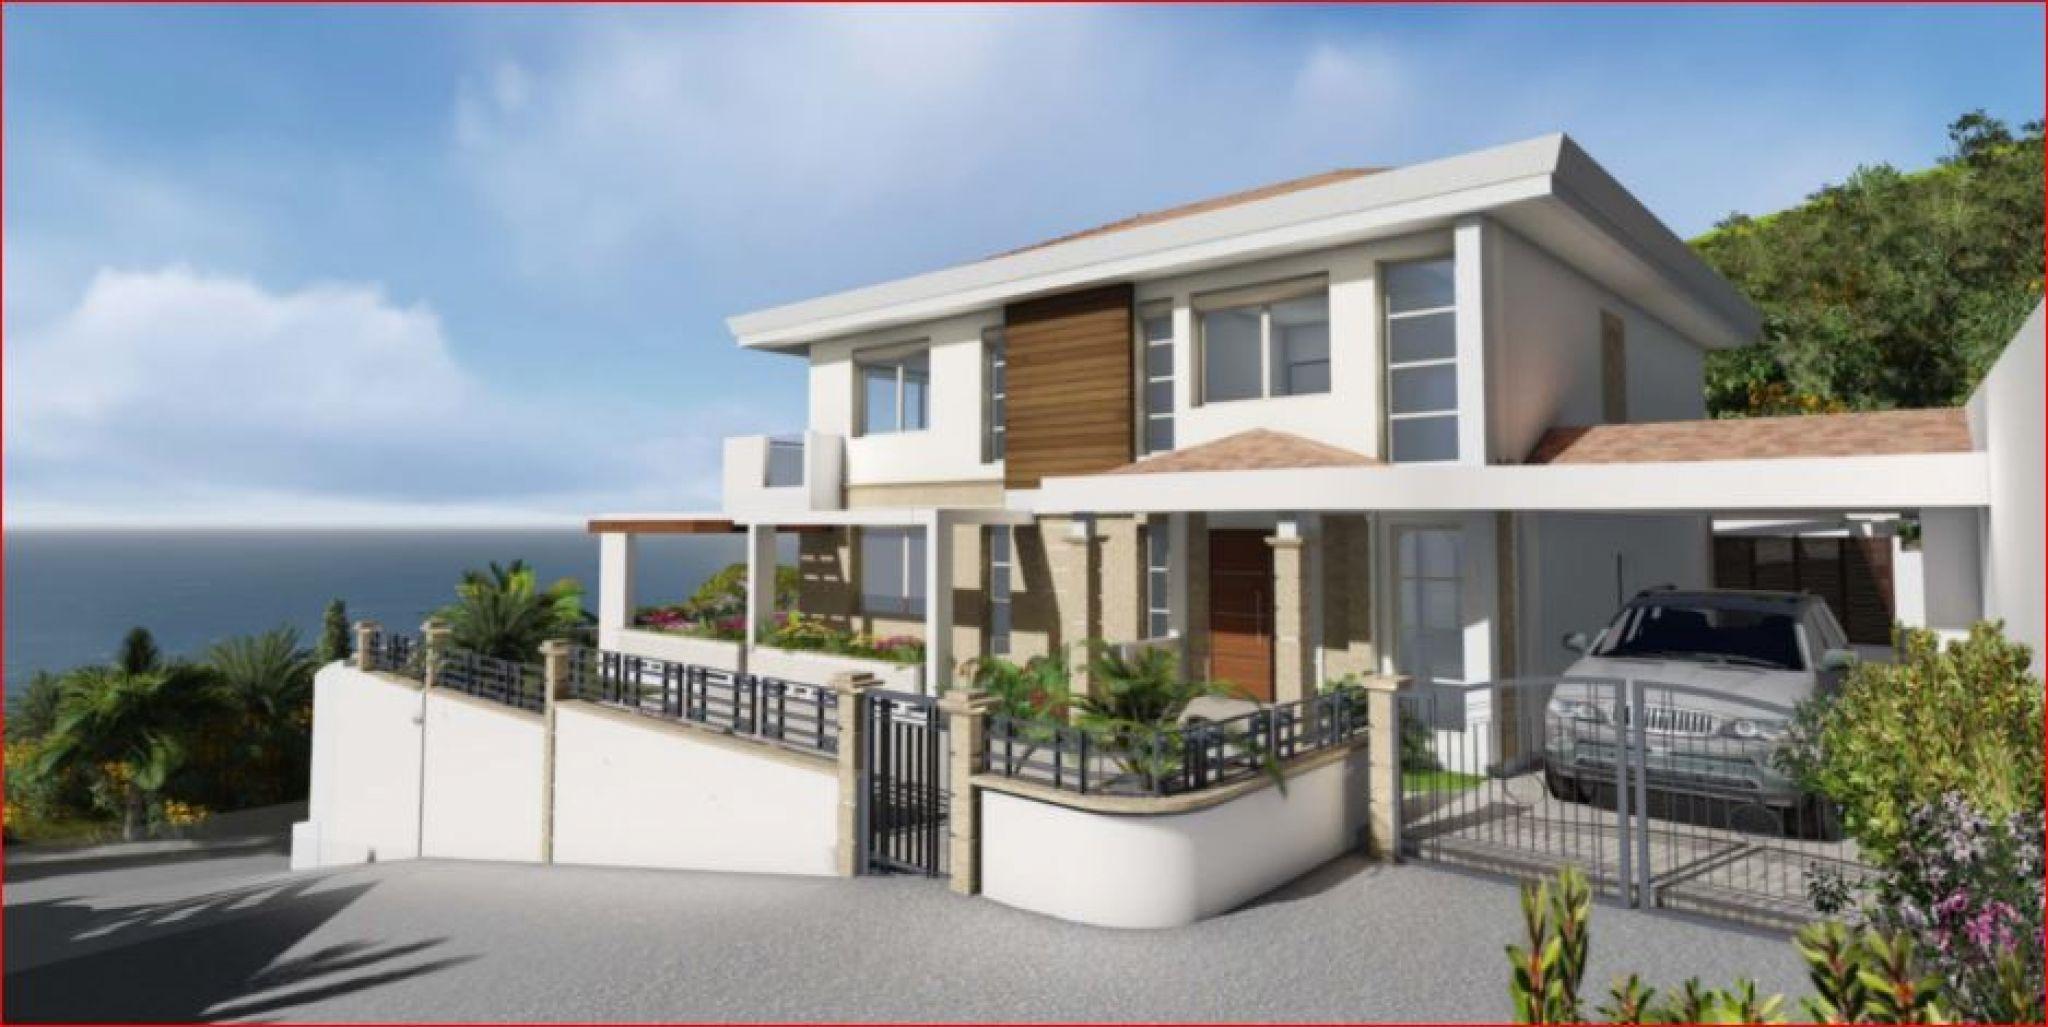 Off plan immobilien zum verkauf 4 schlafzimmer villen for Immobilien zum mieten